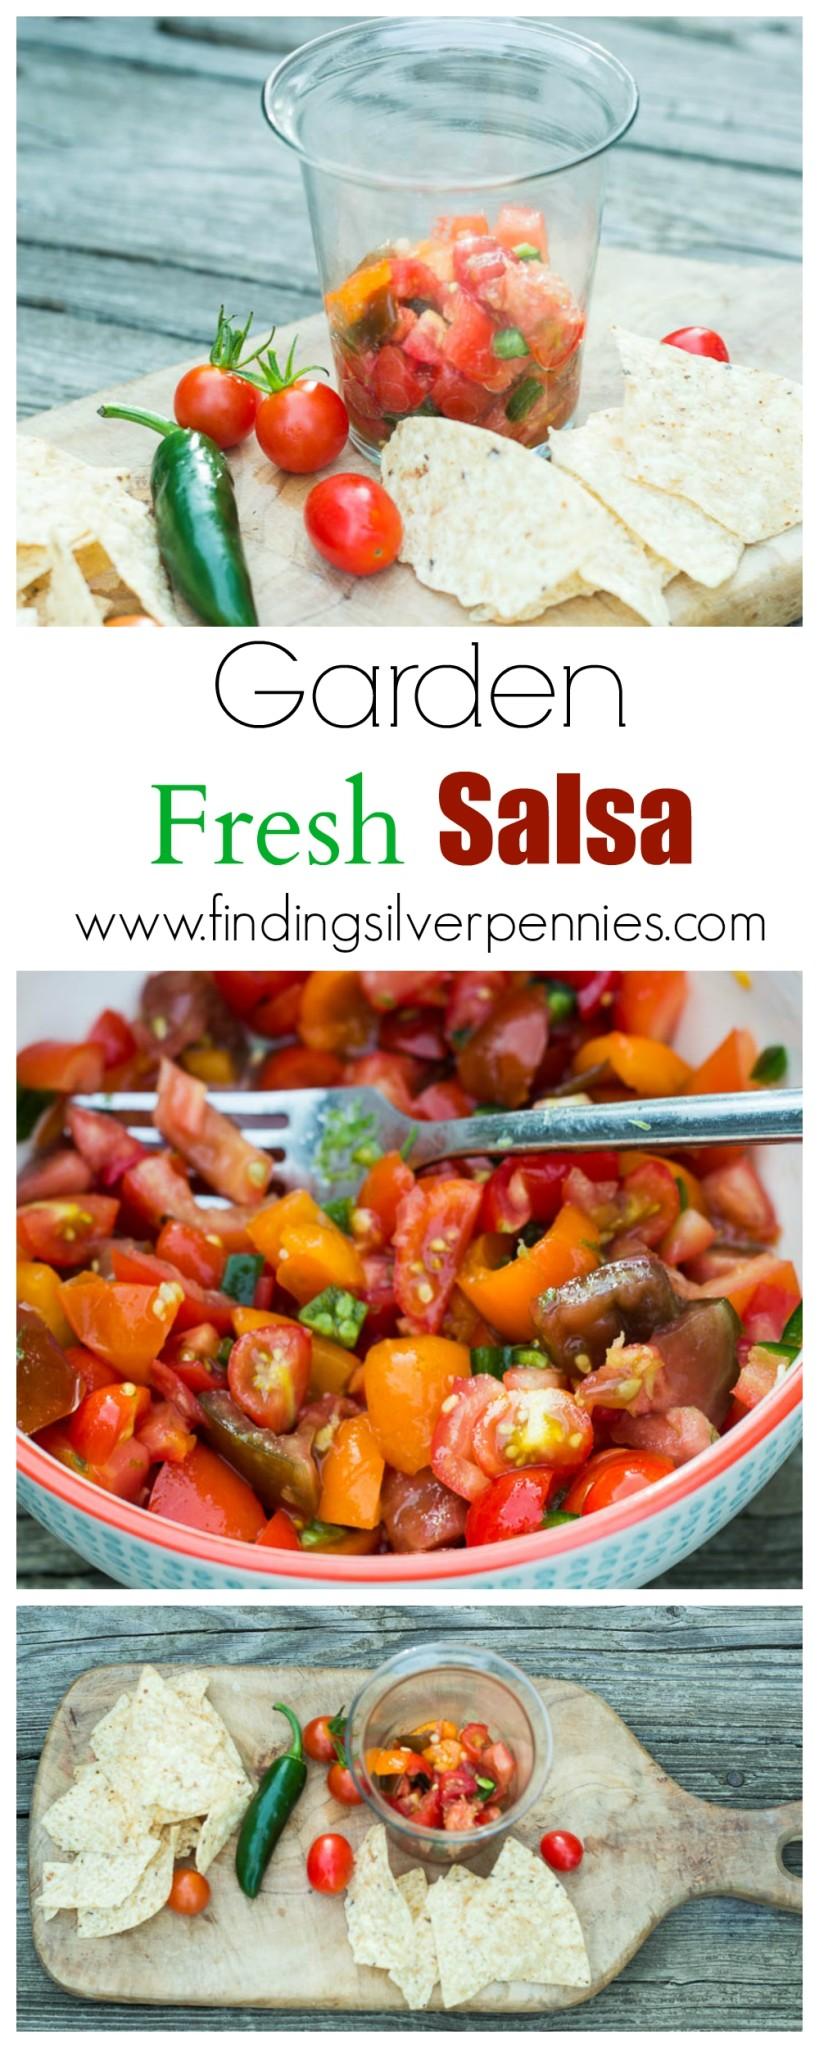 Garden Fresh Salsa How to Make It